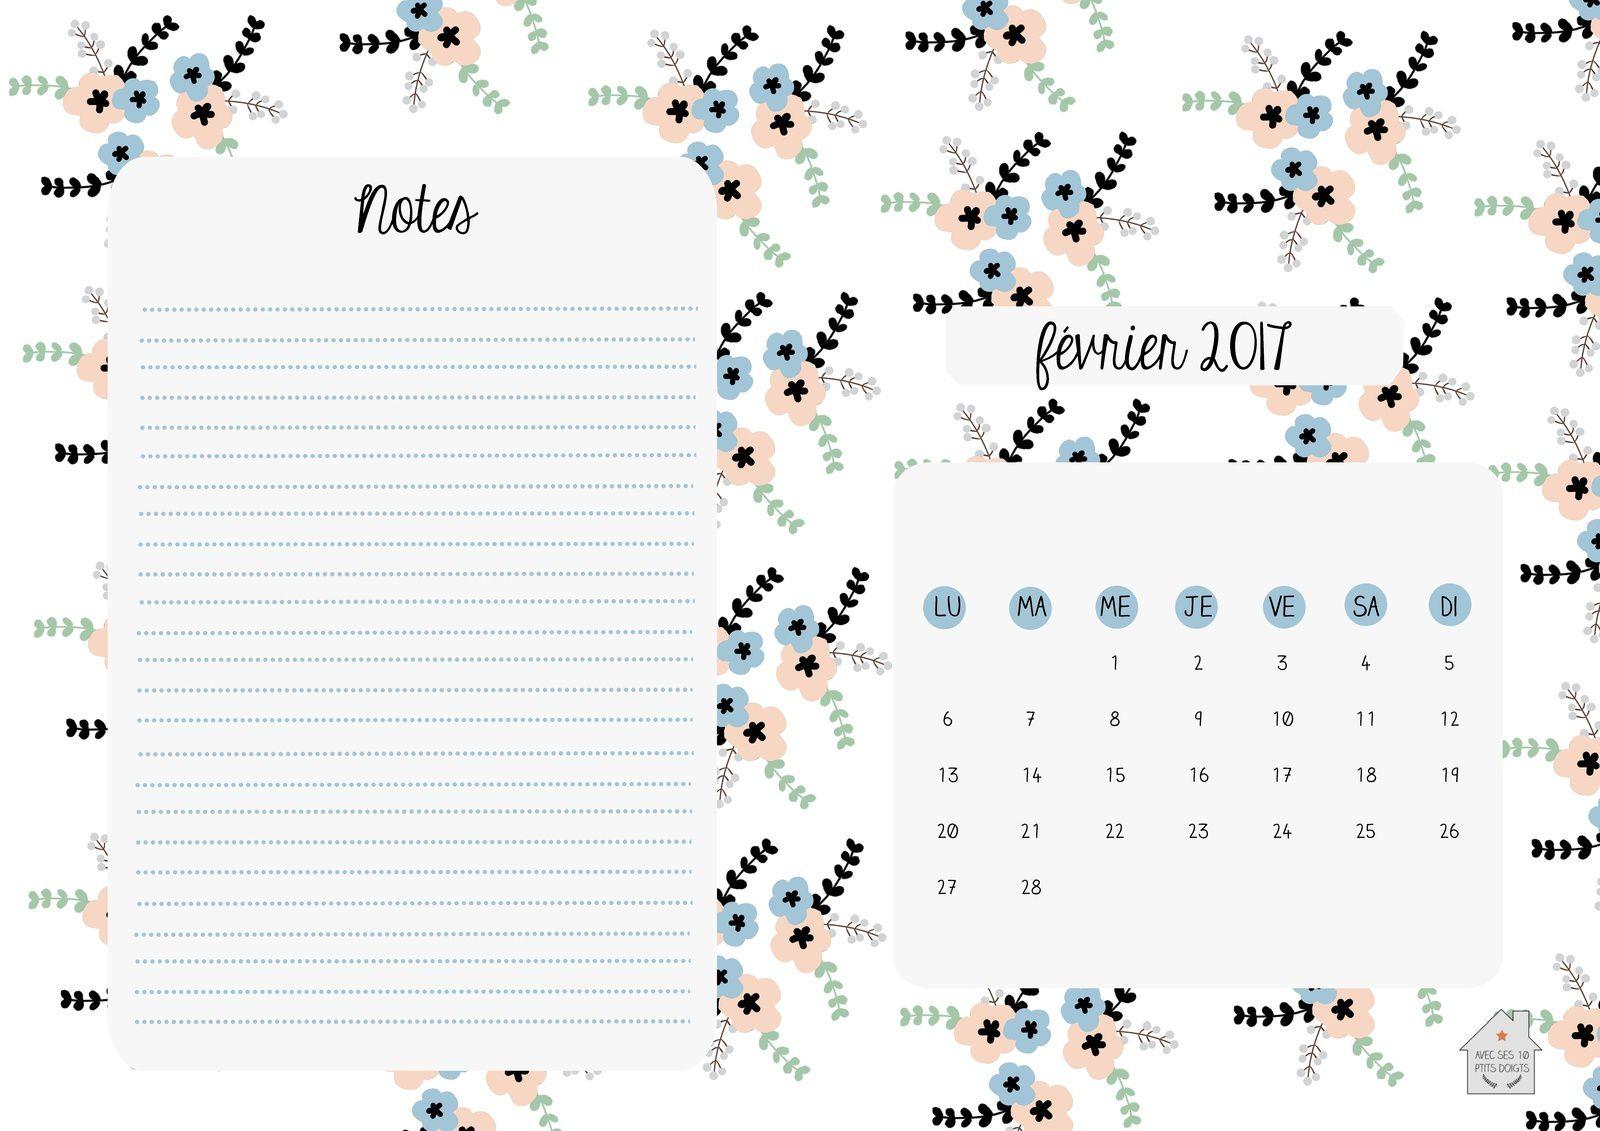 Fevrier Calendrier.Calendrier De Fevrier 2017 Avec Ses 10 Ptits Doigts Blog Diy